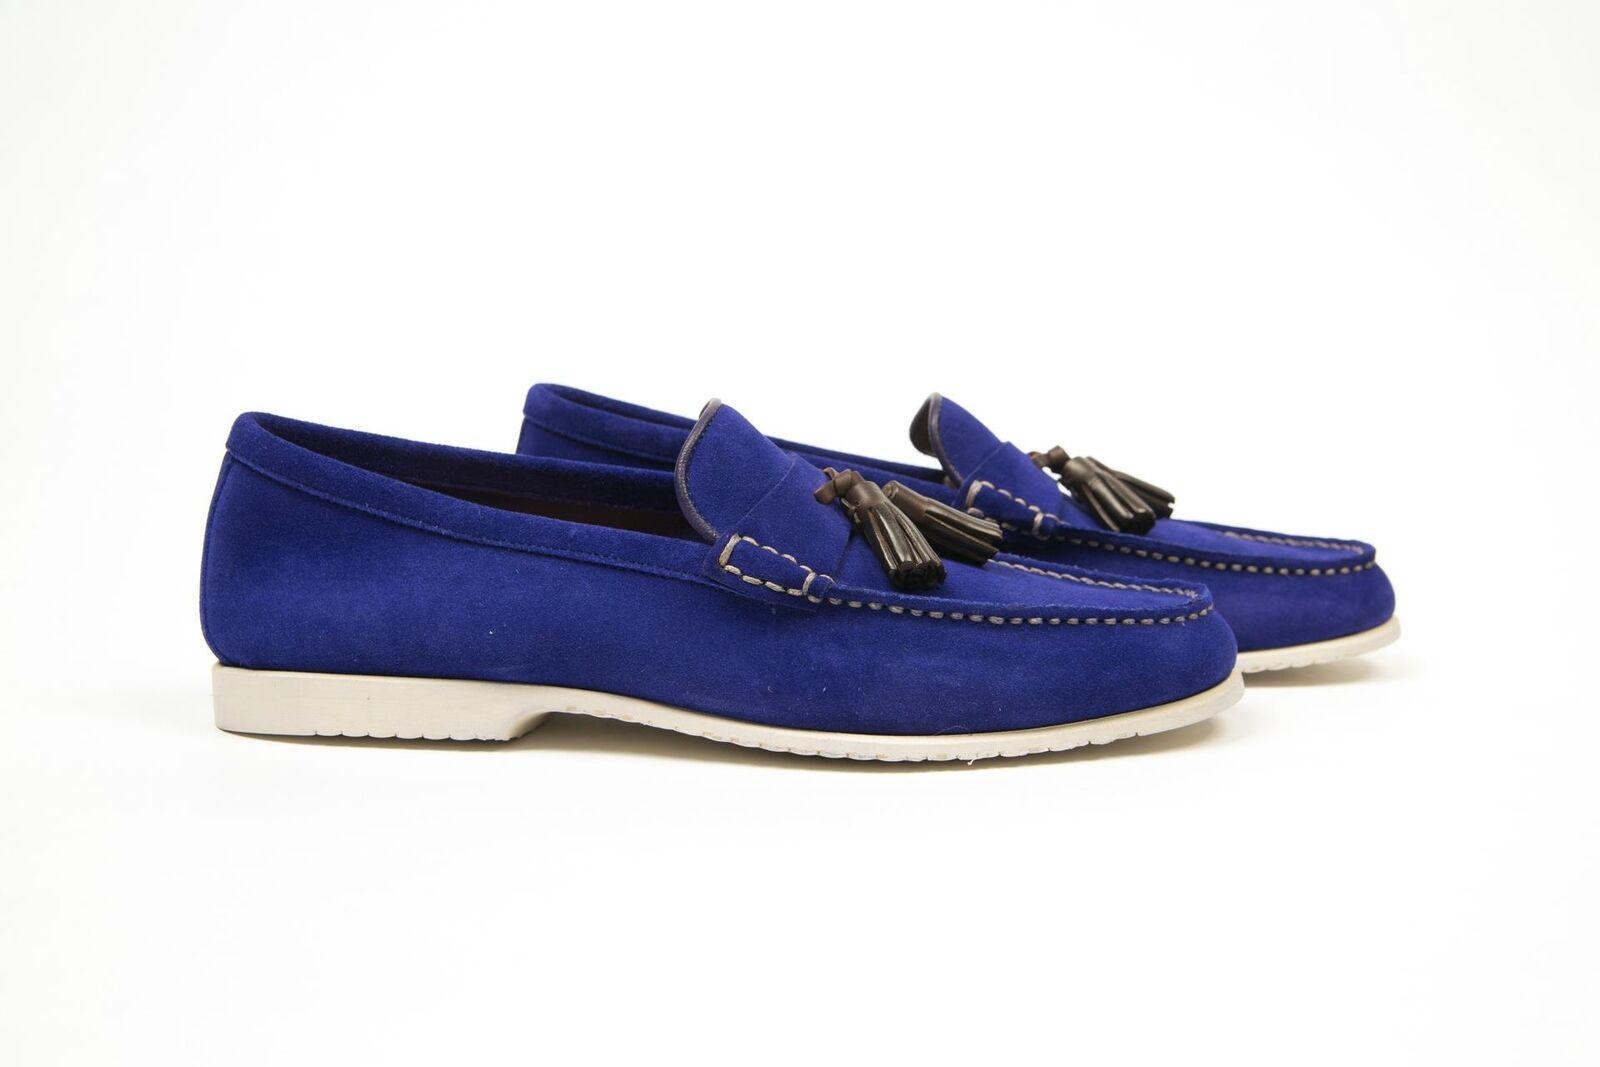 Tom Ford New  790 Suede Dark Blue Tassel Loafers  Slip On Scarpe FW18 9T 10 US